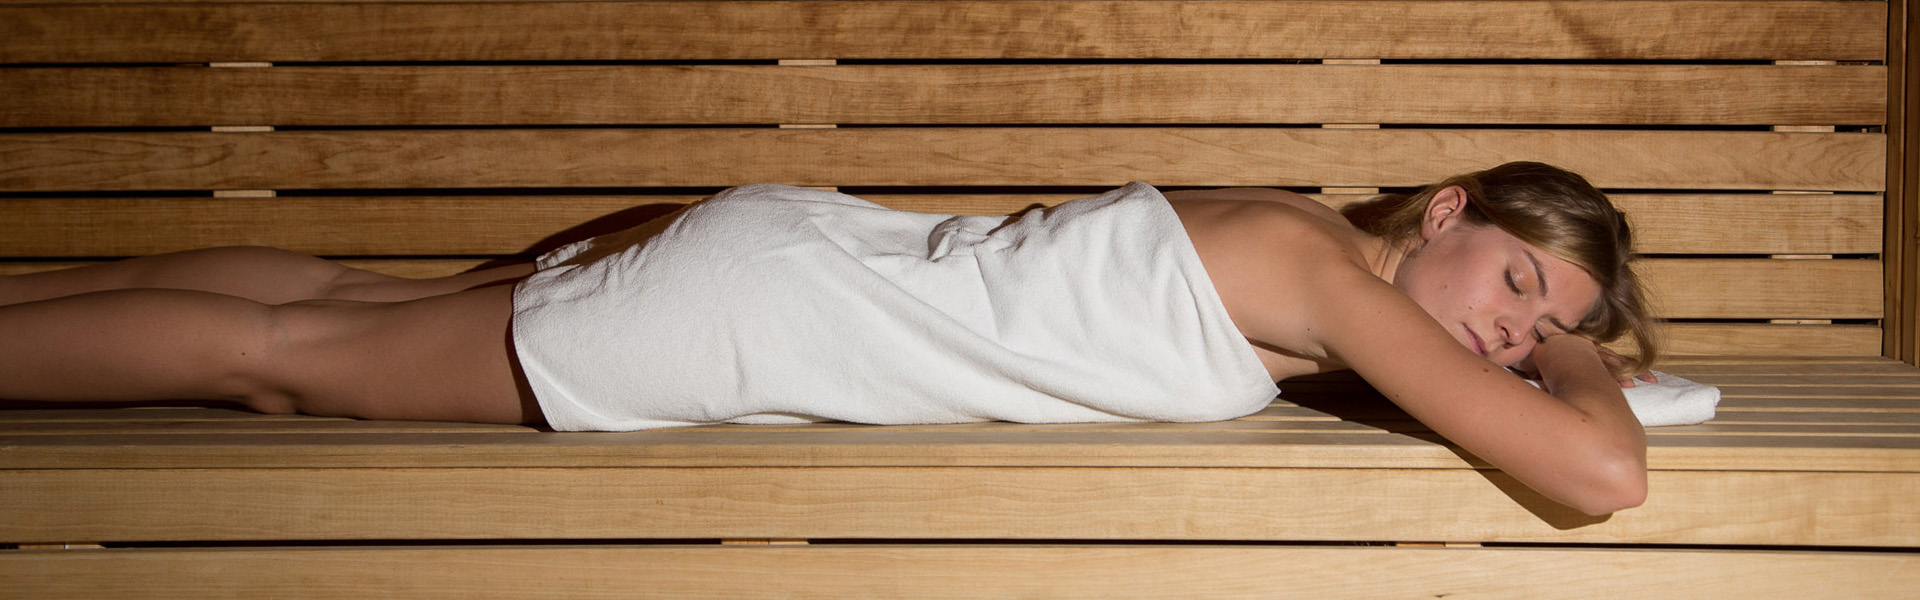 fri massage parlor rida nära gävle